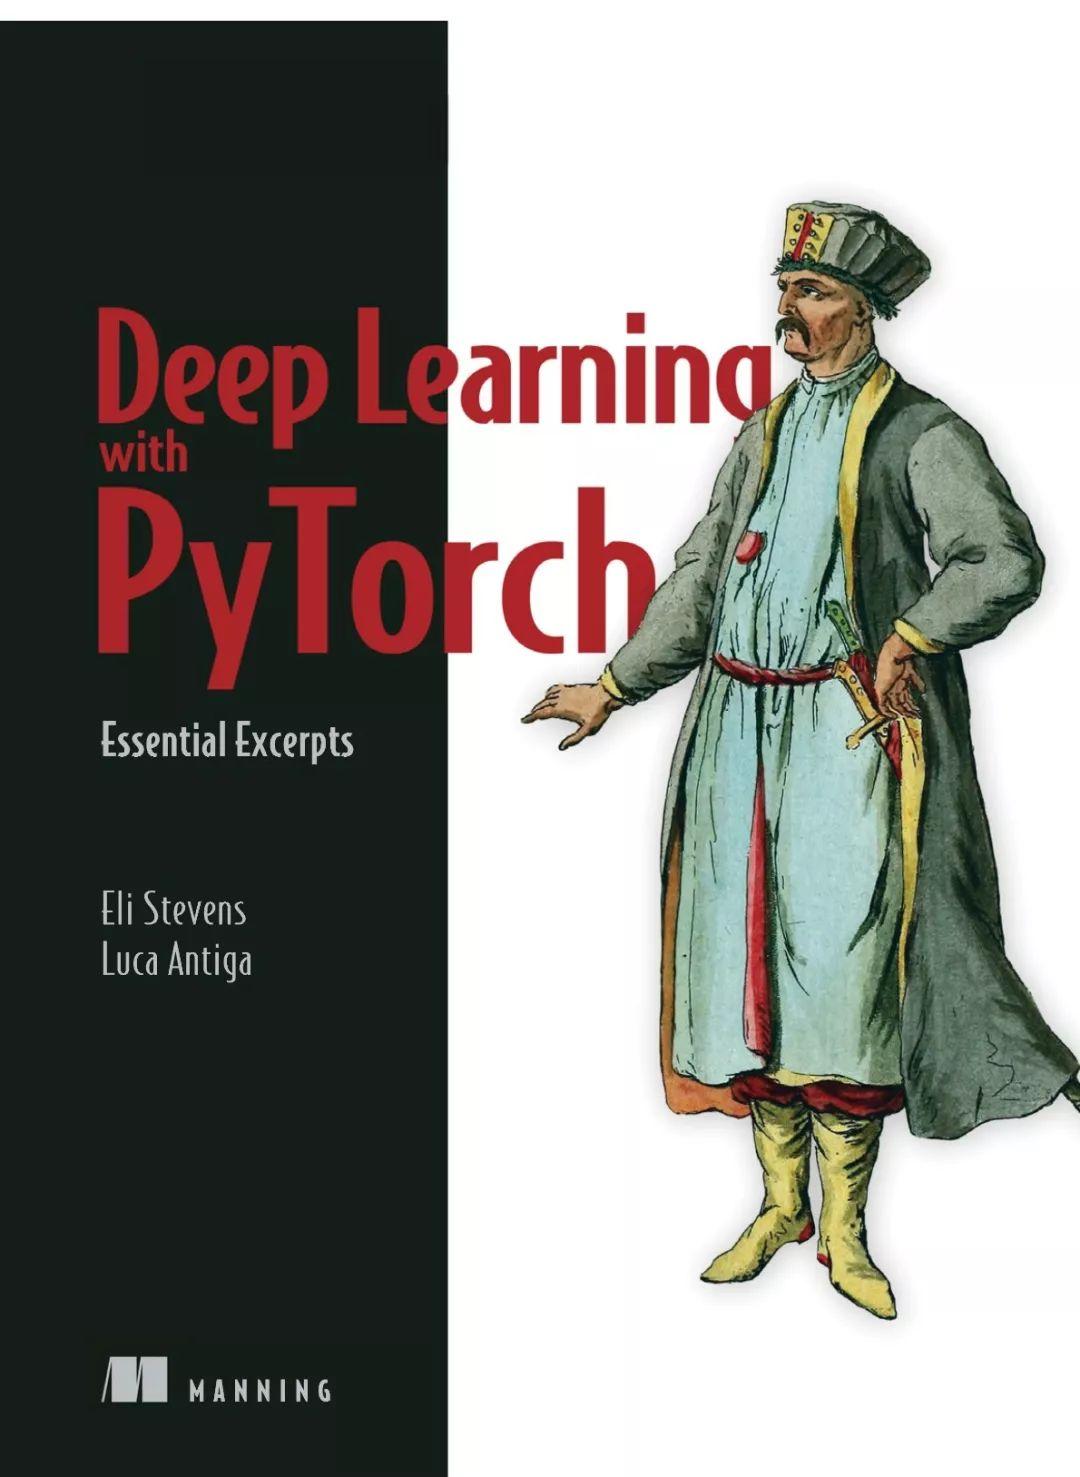 【Pytorch官方新书】PyTorch 深度学习, 141页pdf, 必备宝典, 通俗易懂